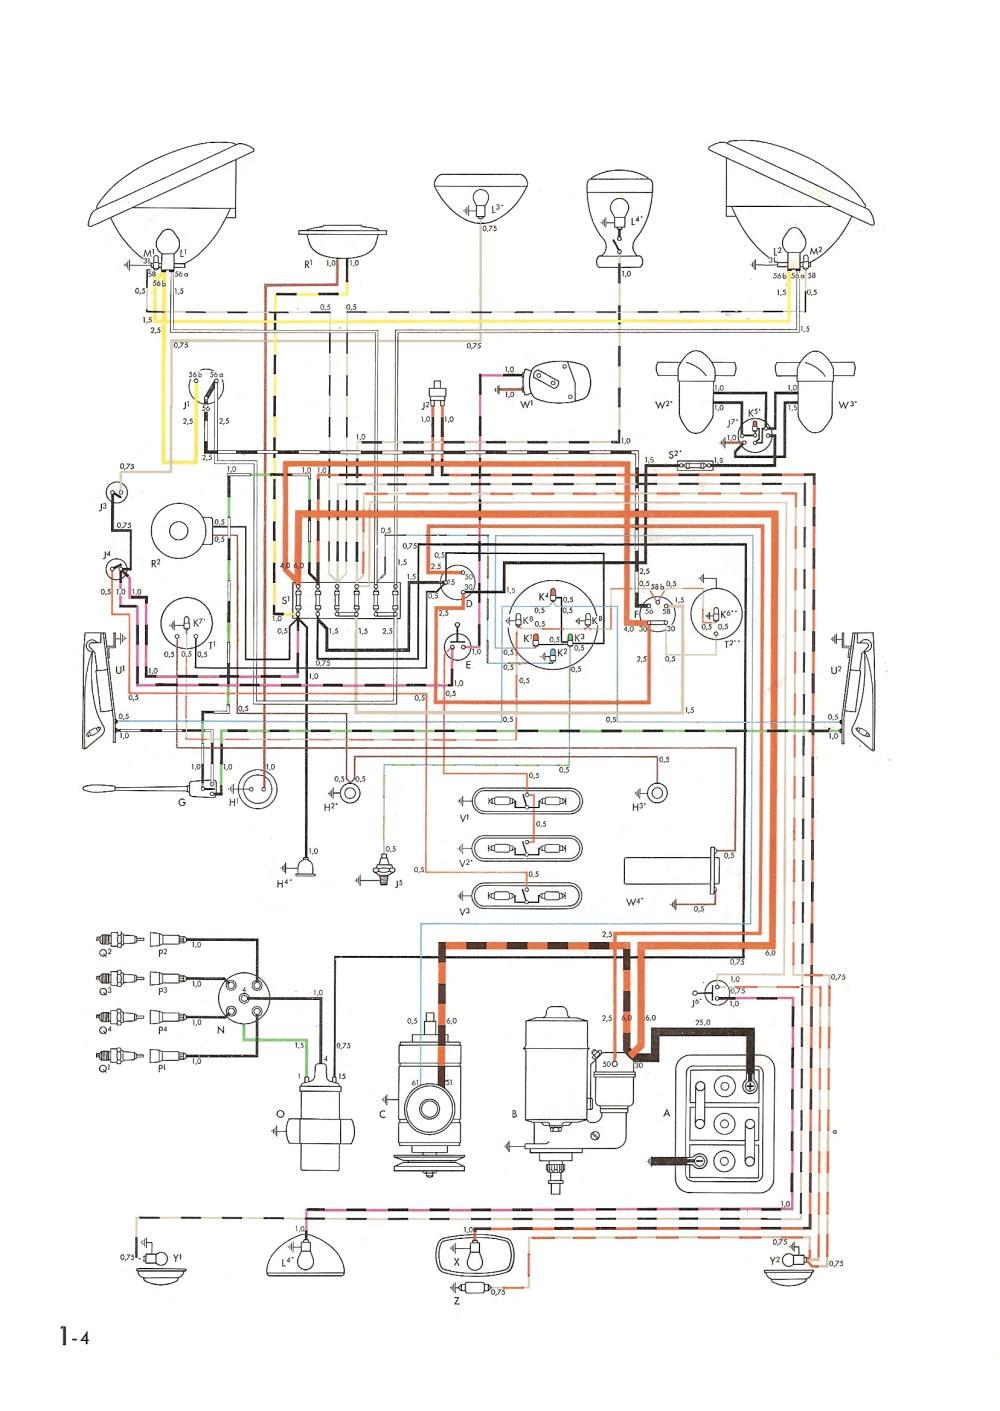 medium resolution of champion bus wiring diagram wiring diagram origin braun wiring diagram elkhart coach wiring diagram